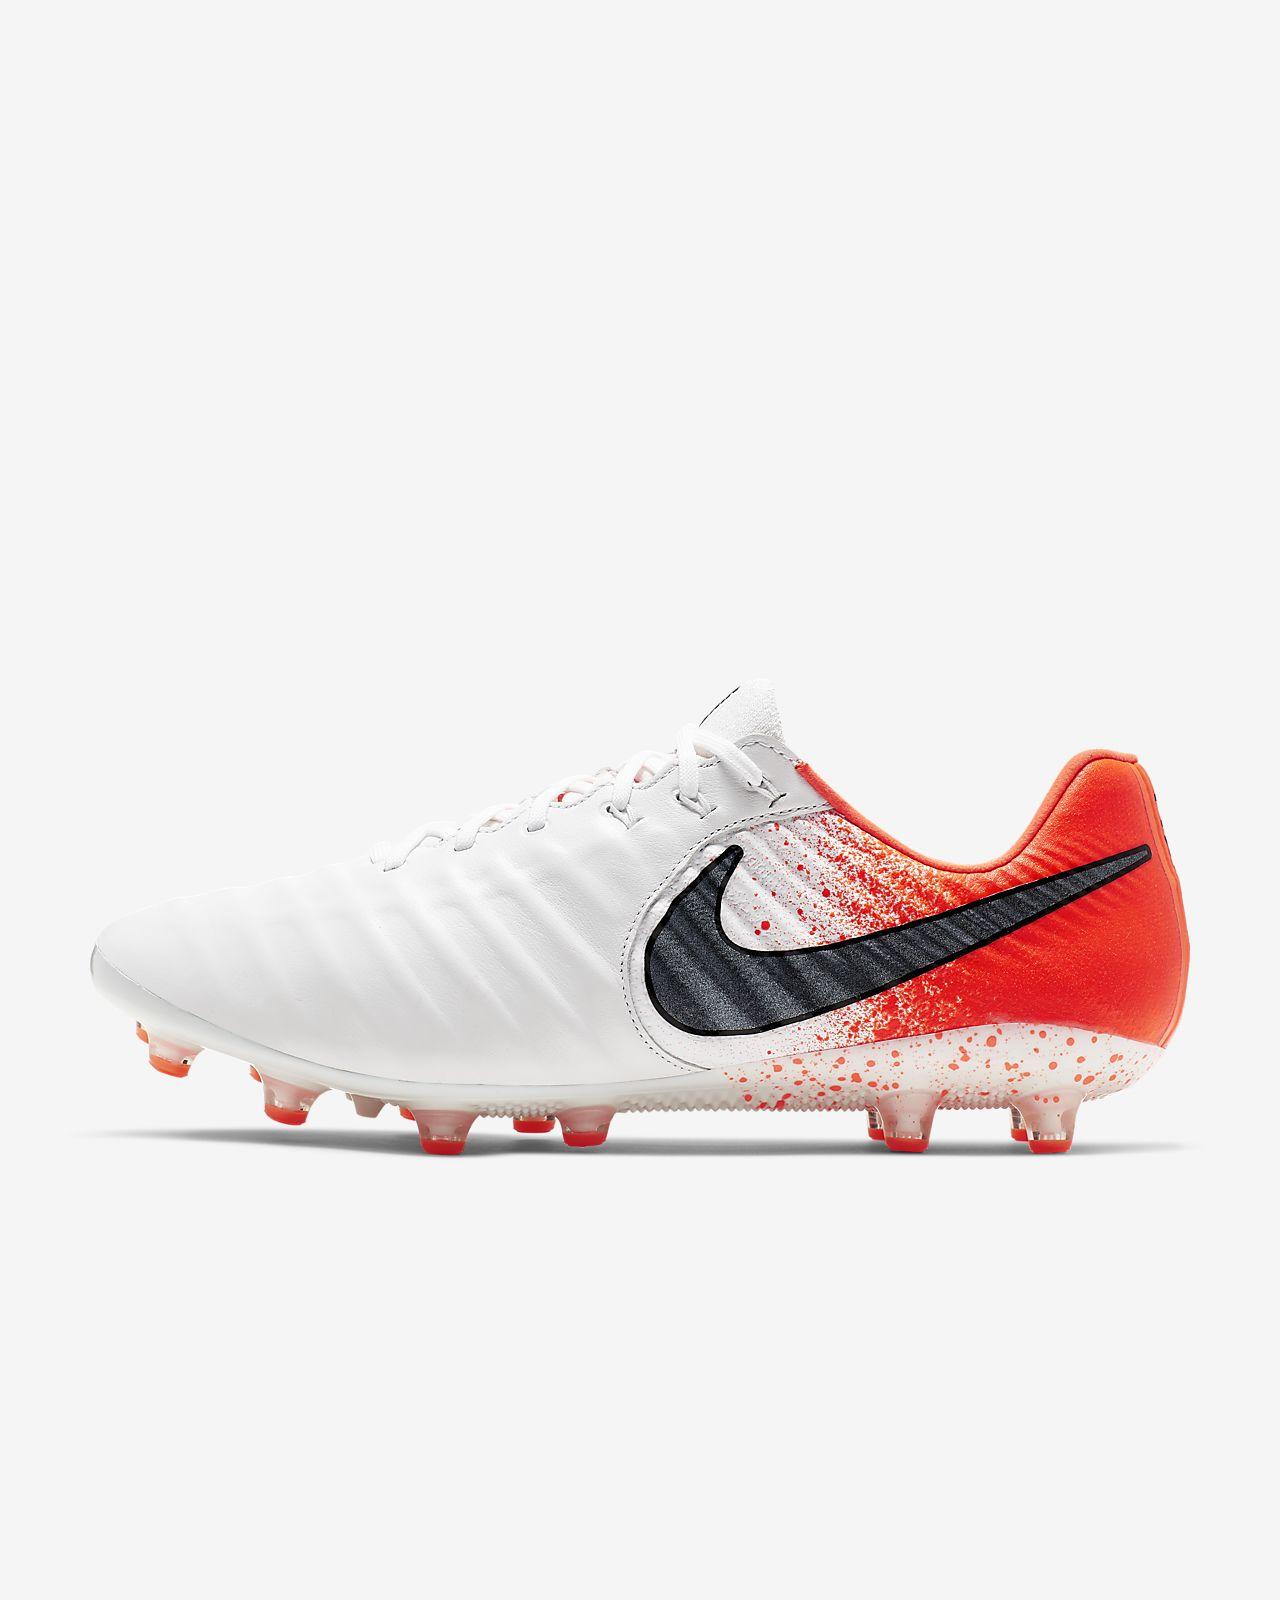 premium selection 60e16 5656f ... Fotbollssko för konstgräs Nike Legend VII Elite AG-PRO